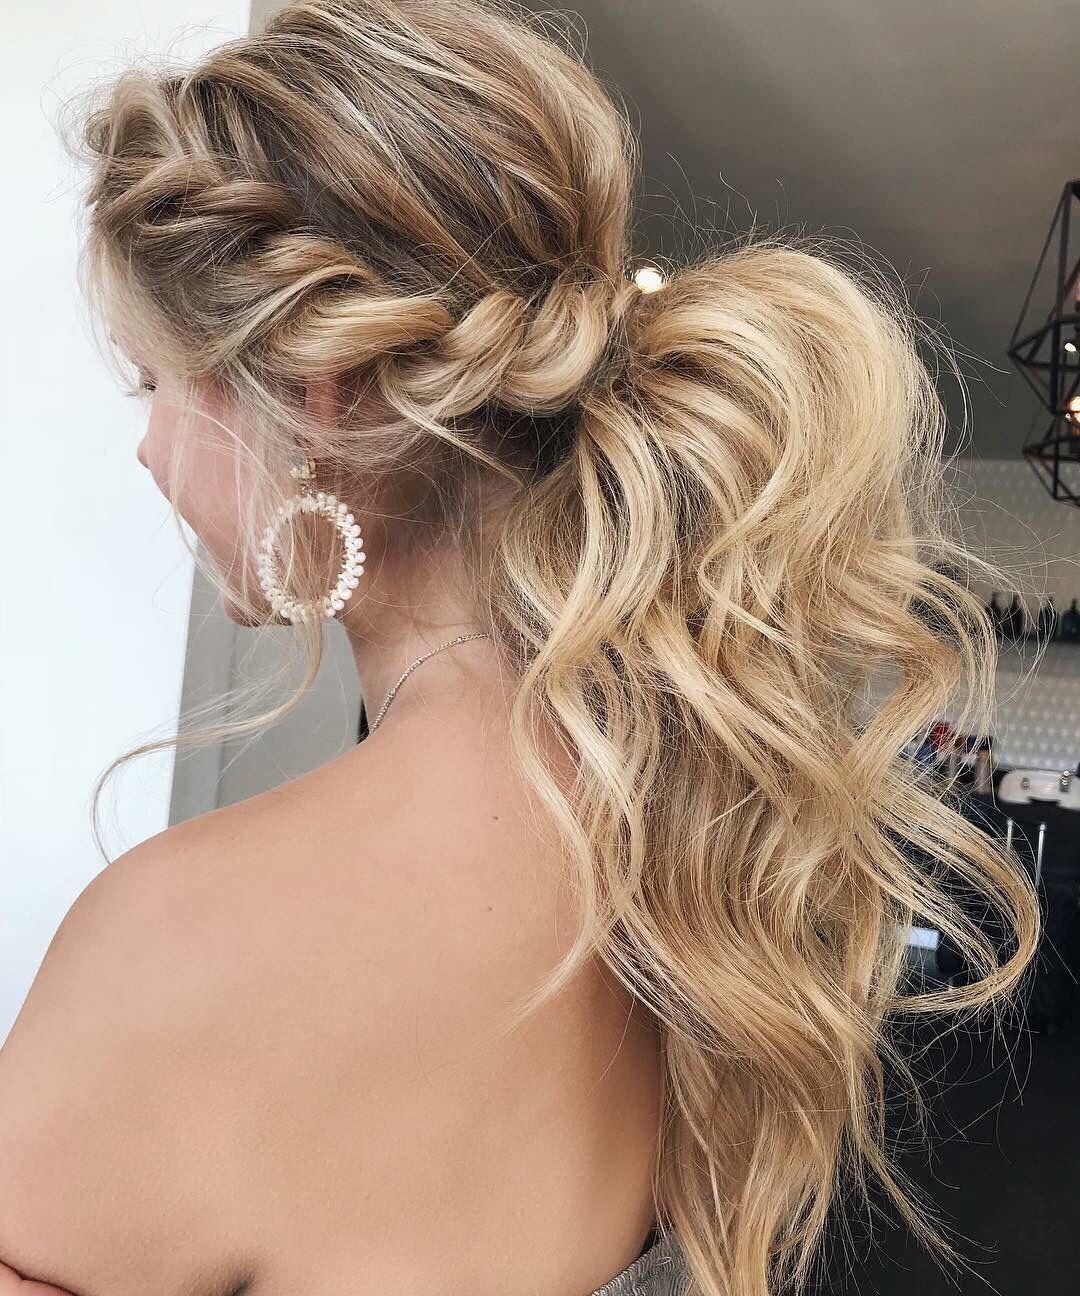 hair- @emmachenartistry model- @ella_victoriaa @adamehair